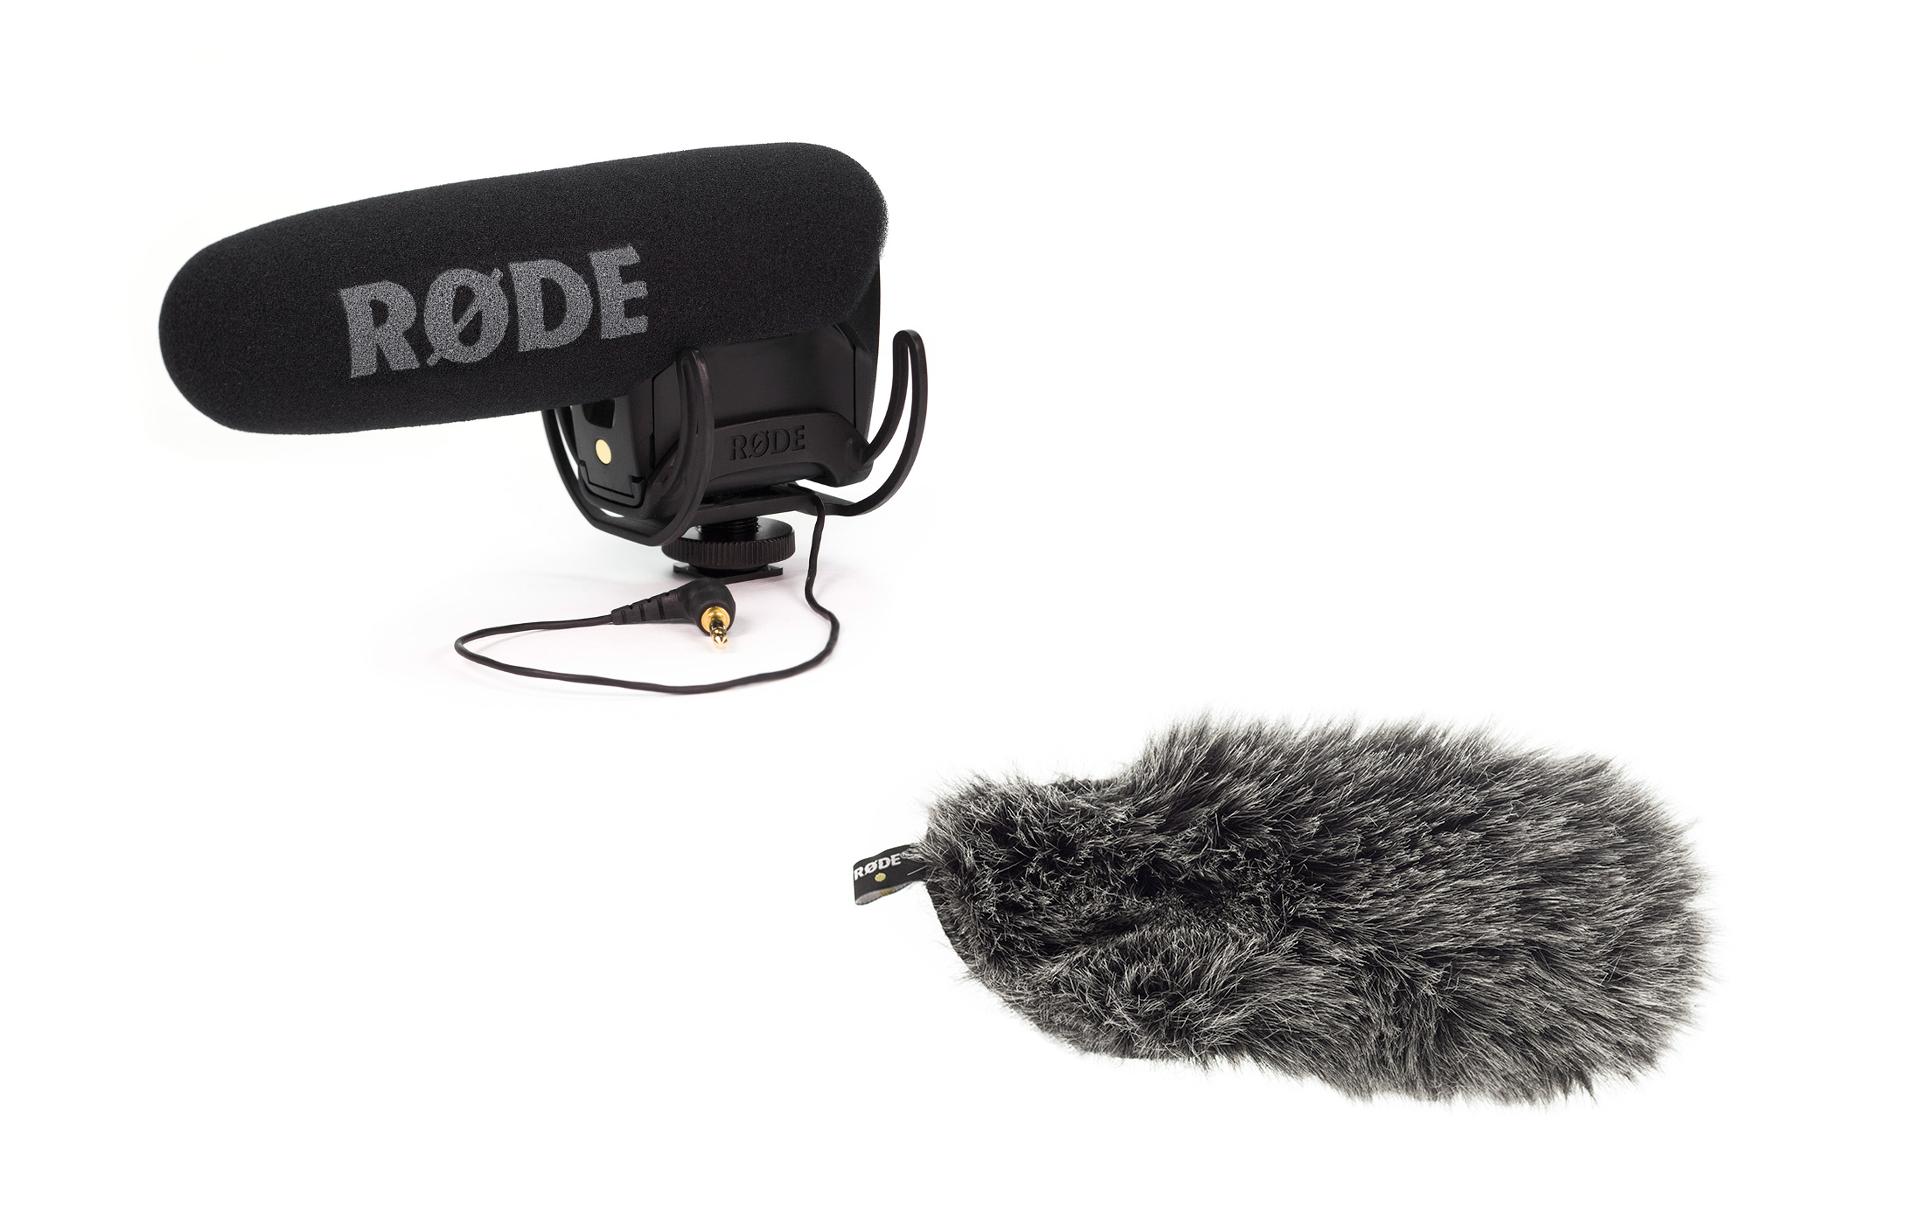 On-Camera Mic with Rycote Lyre Shock Mount plus Deadcat VMPR